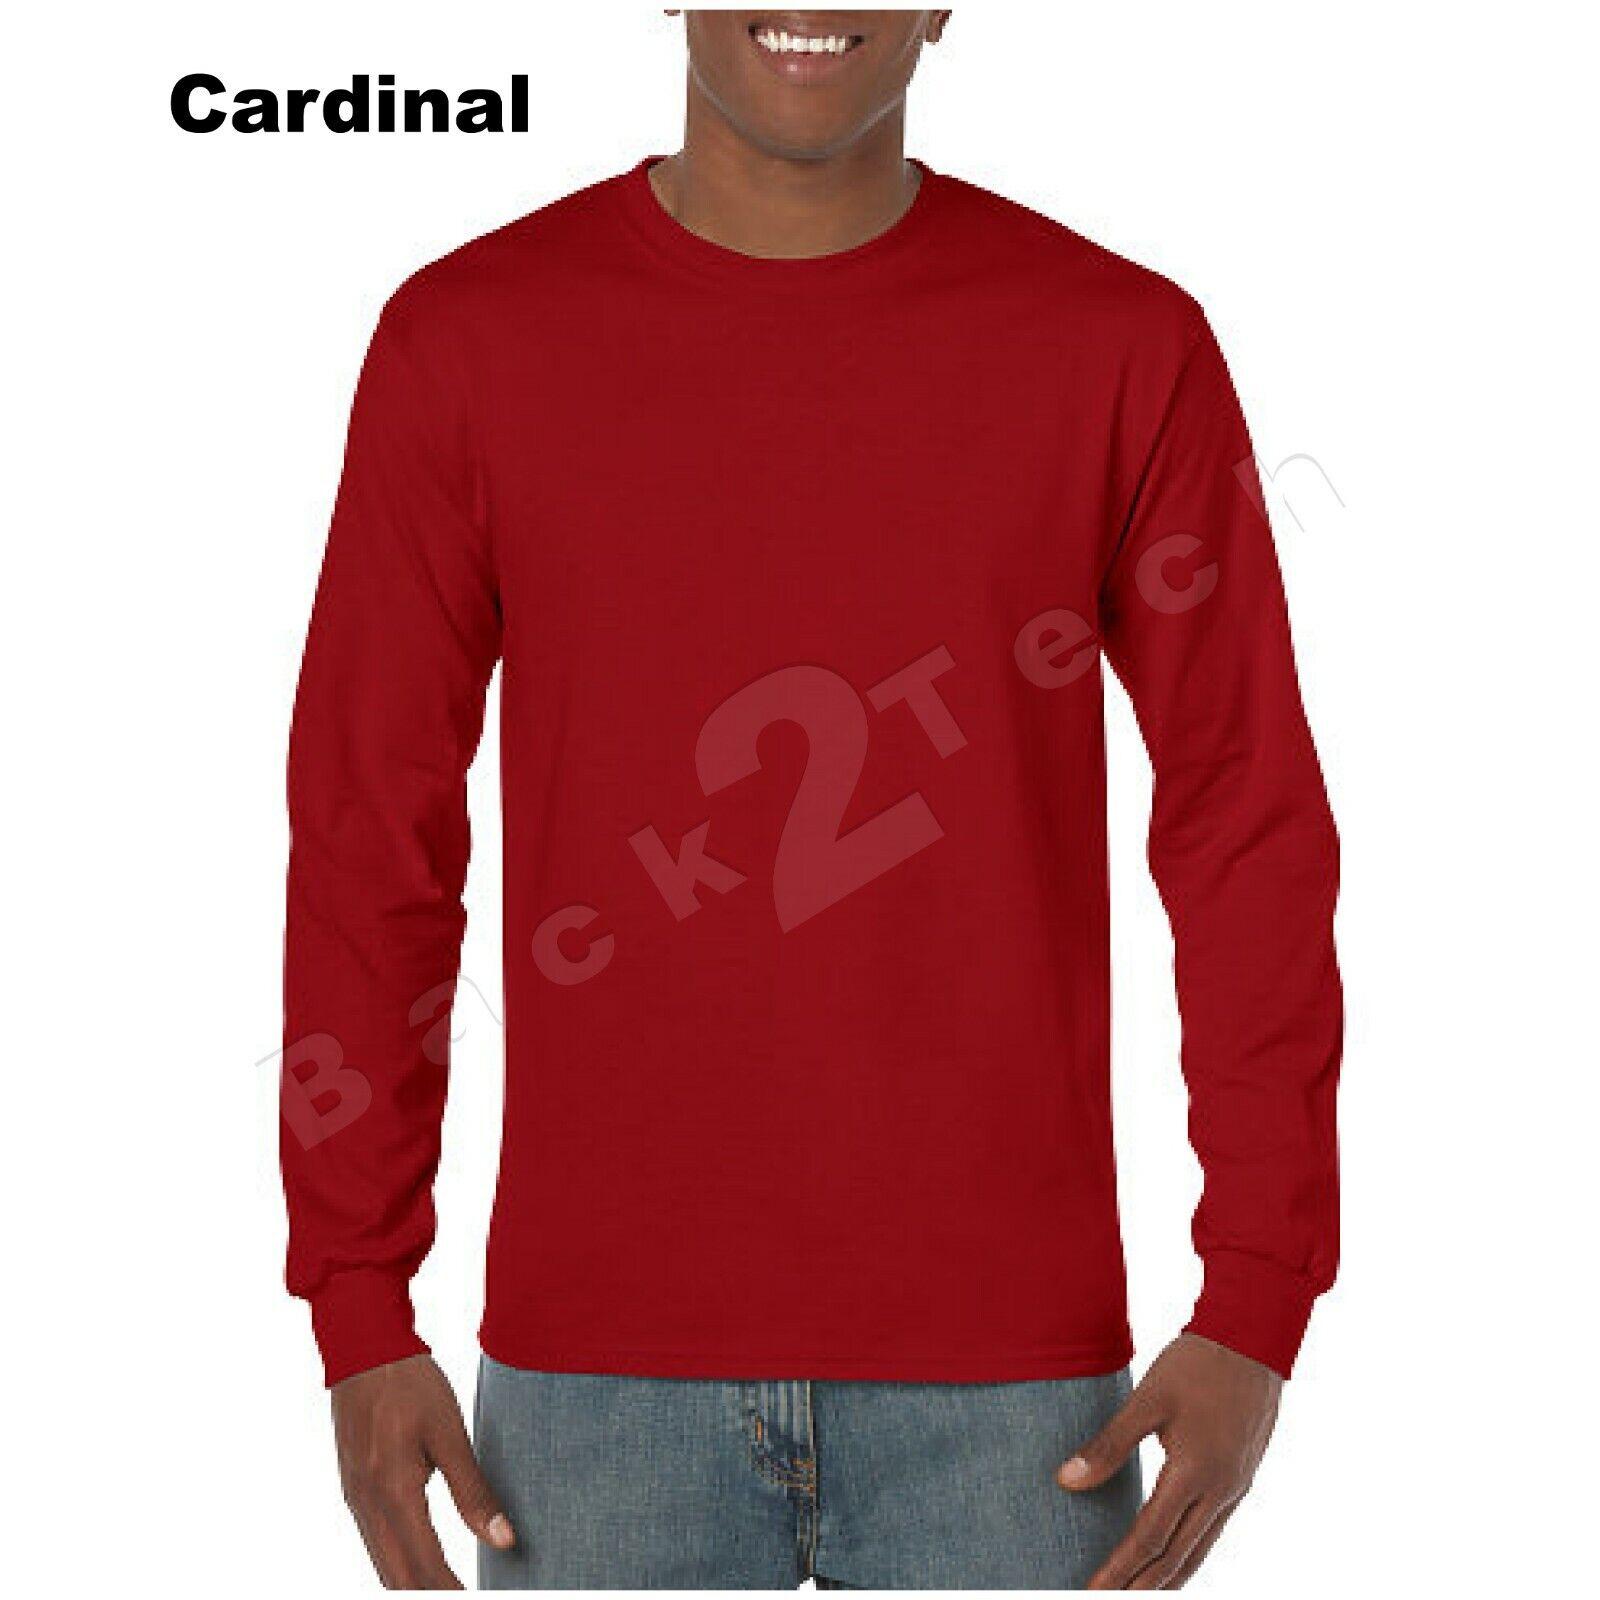 CardinalRed